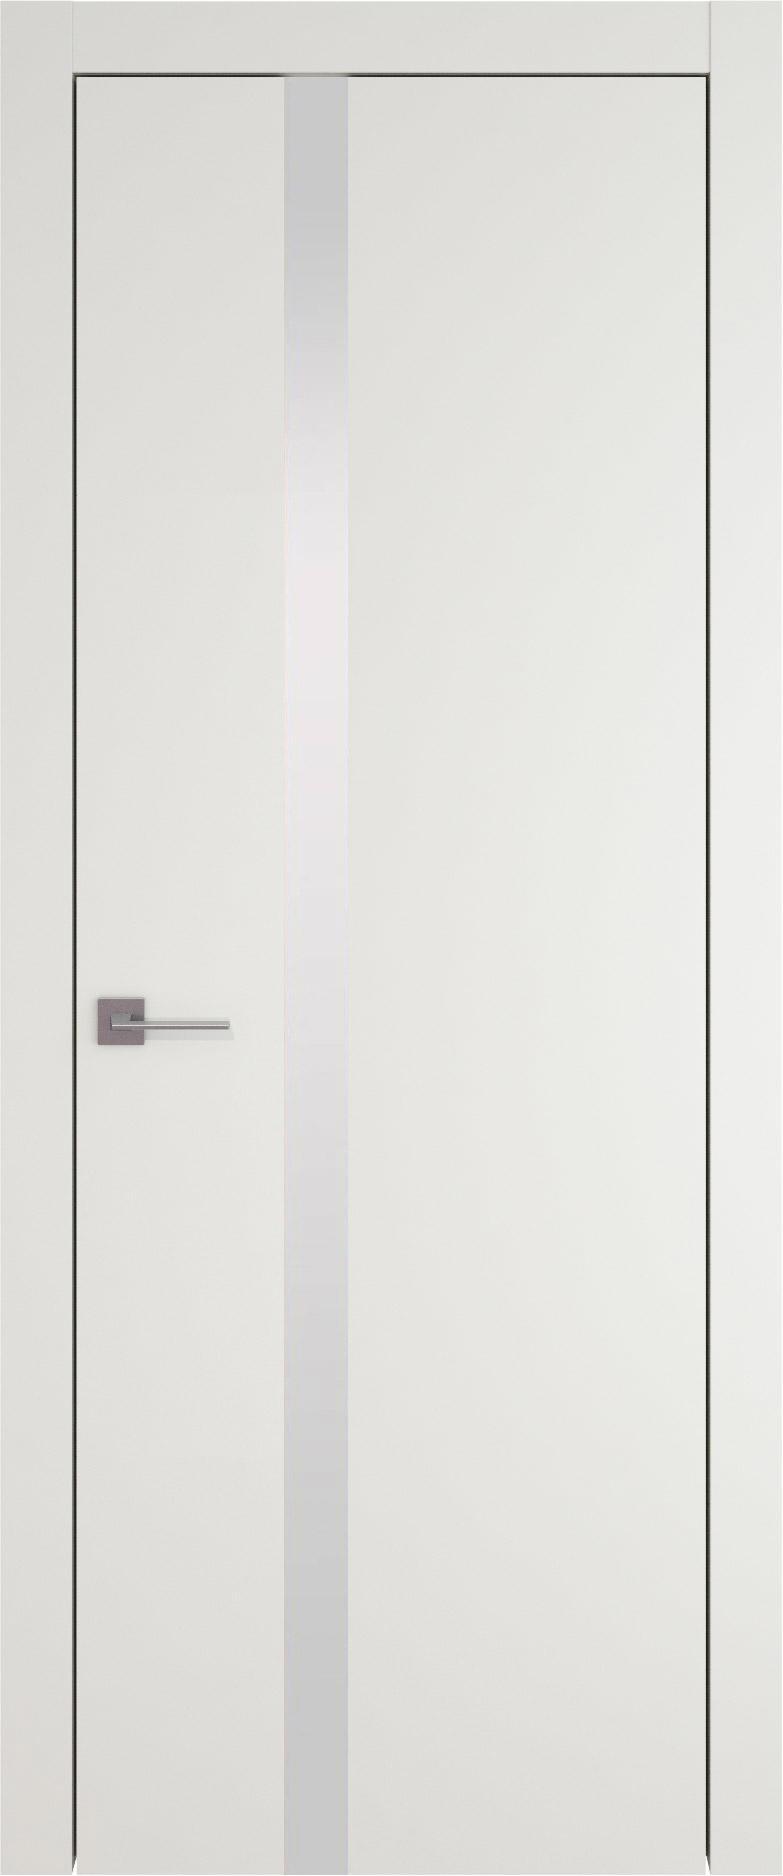 Tivoli Д-1 цвет - Бежевая эмаль (RAL 9010) Без стекла (ДГ)